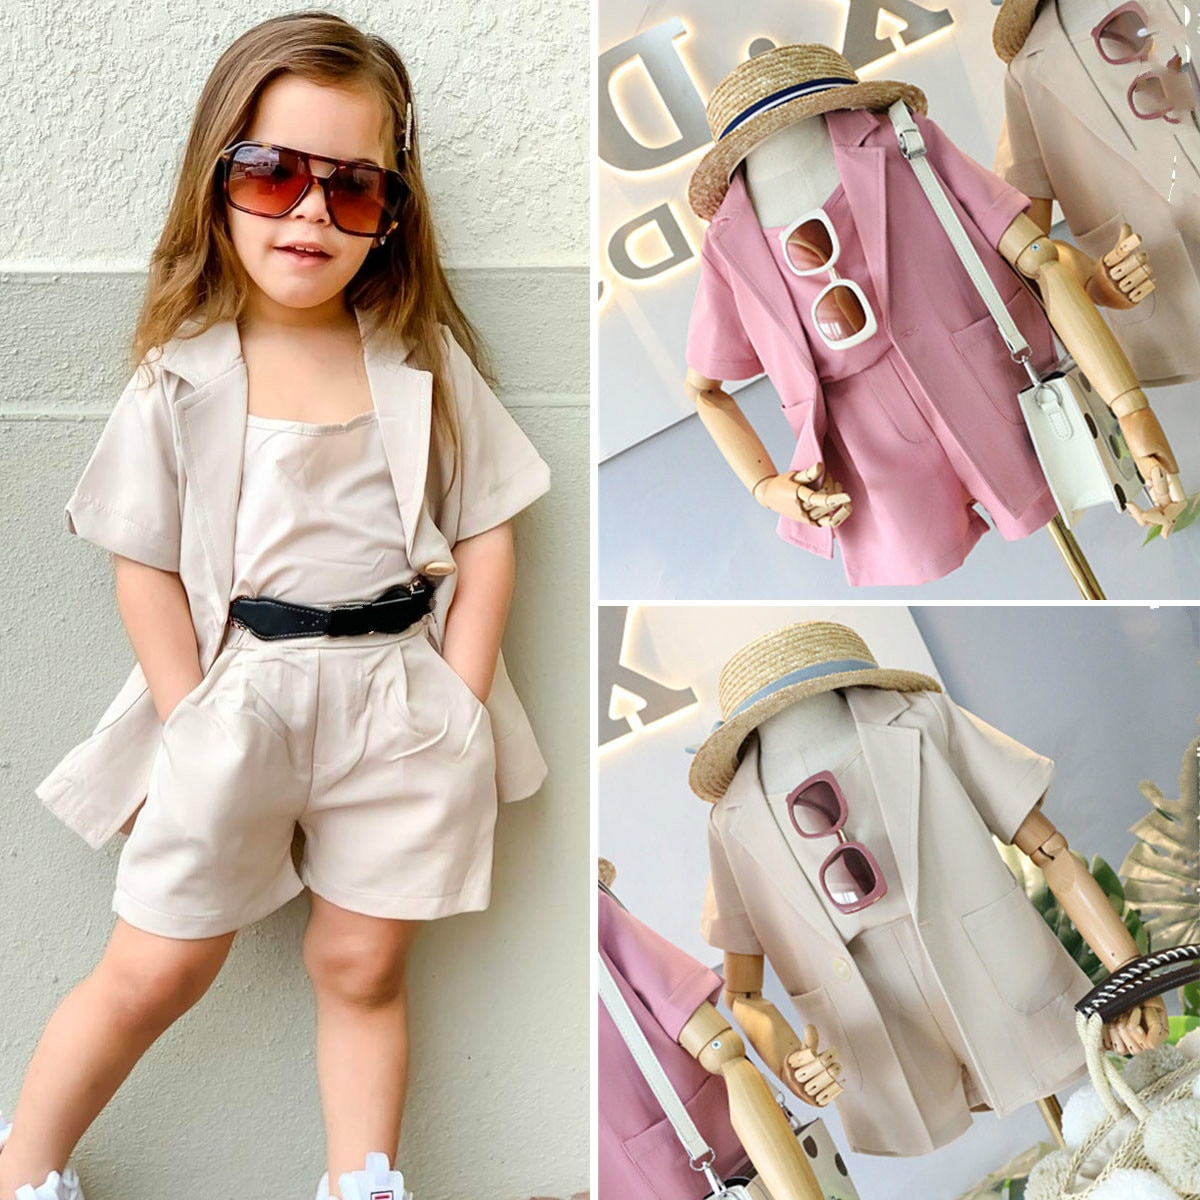 2-7y moda infantil bebê meninas conjuntos de roupas 3pcs sólido colete tops + manga curta blazer casaco + shorts outfits